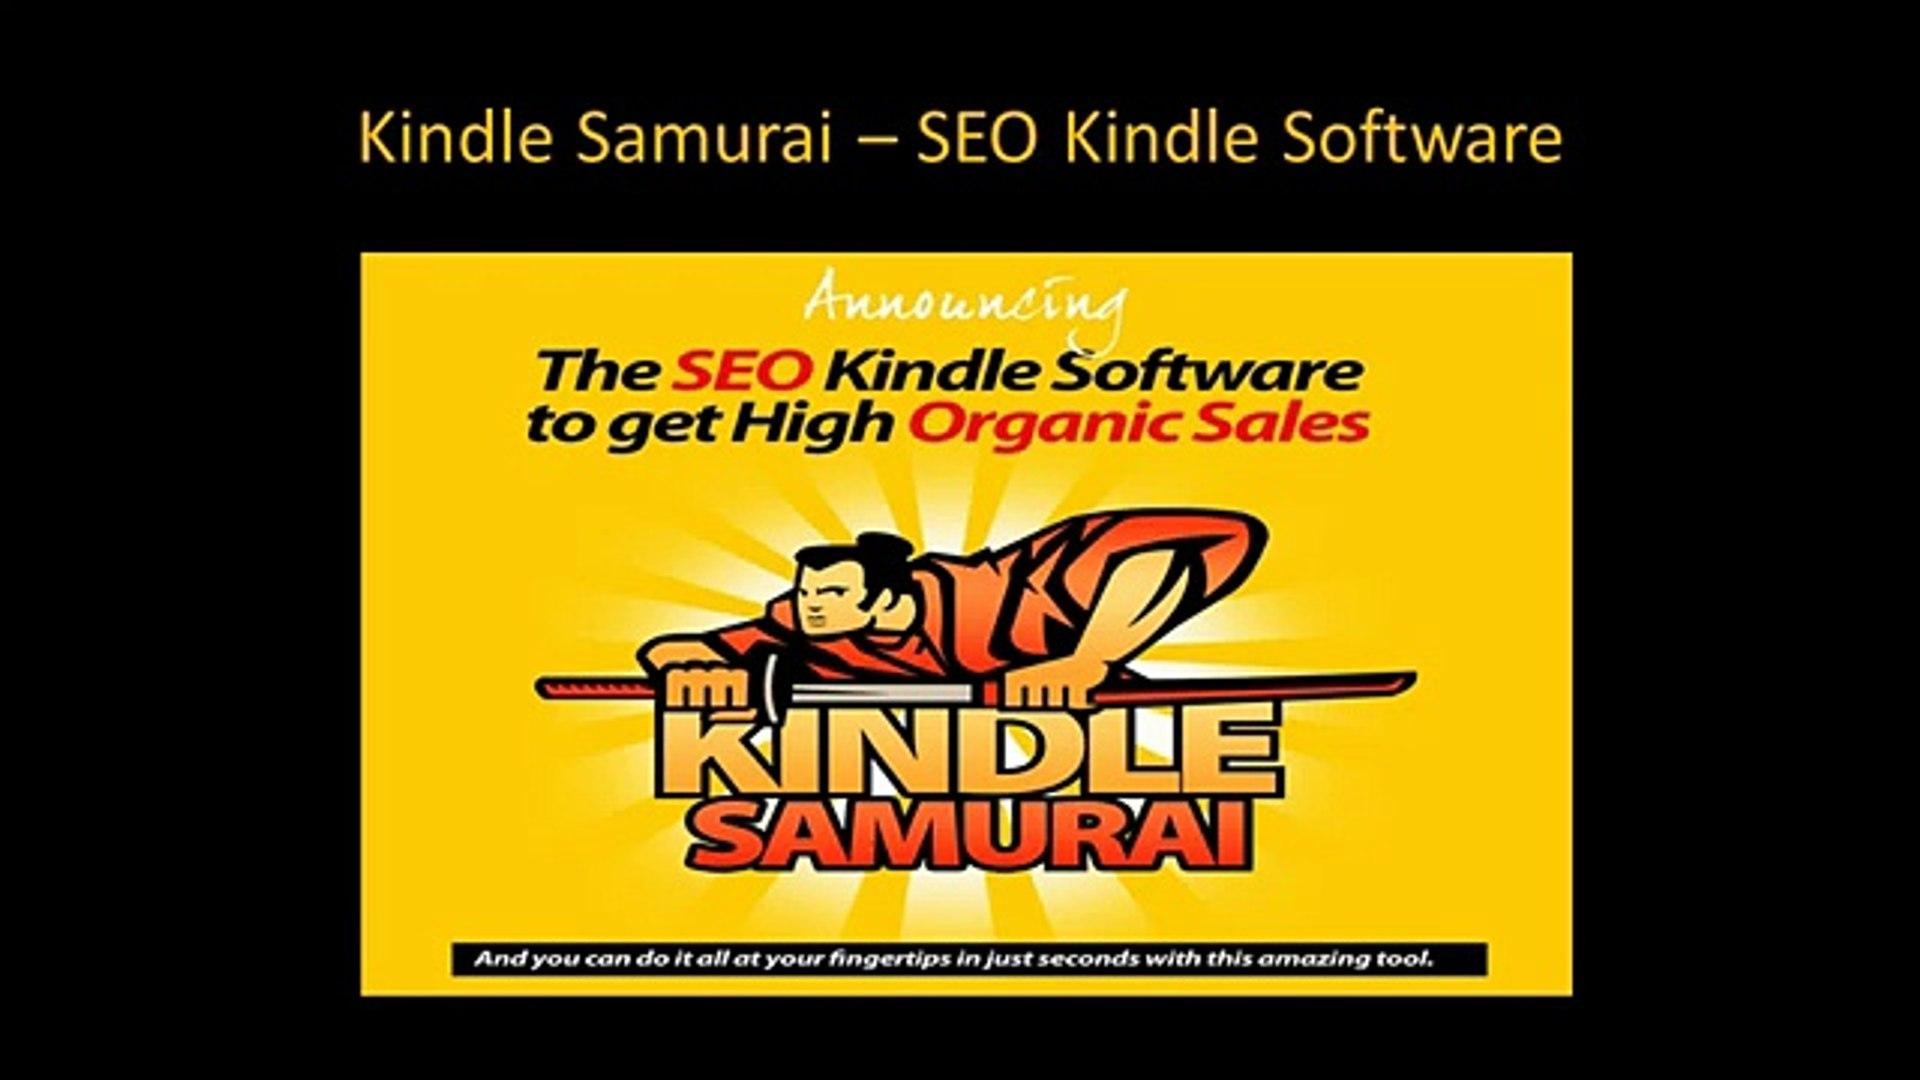 **Kindle Samurai - SEO Kindle Software | Kindle Samurai Review